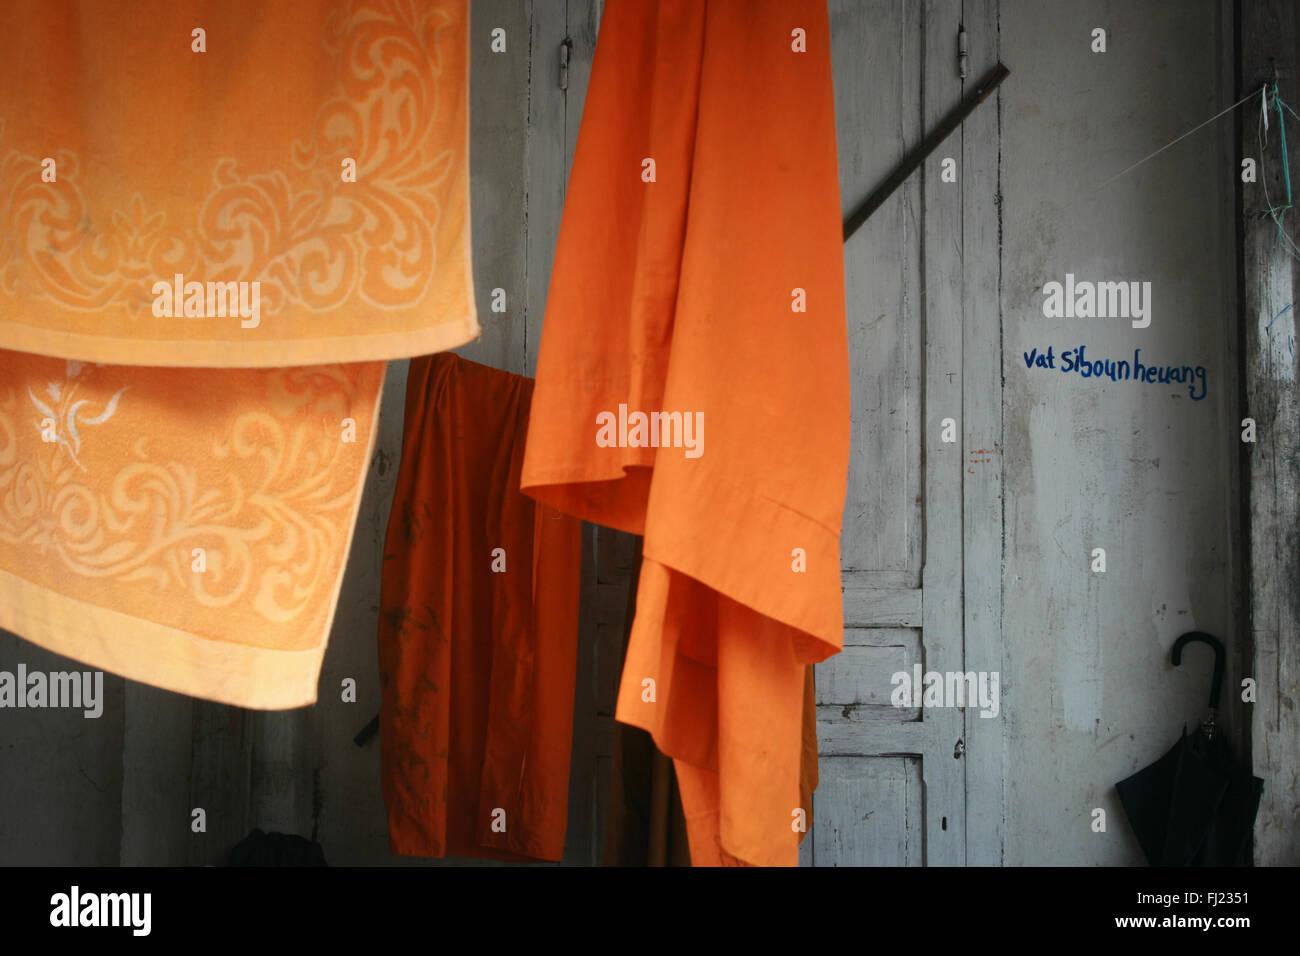 Safran vestido tradicional color naranja monje budista en Luang Prabang, Laos, Asia Imagen De Stock